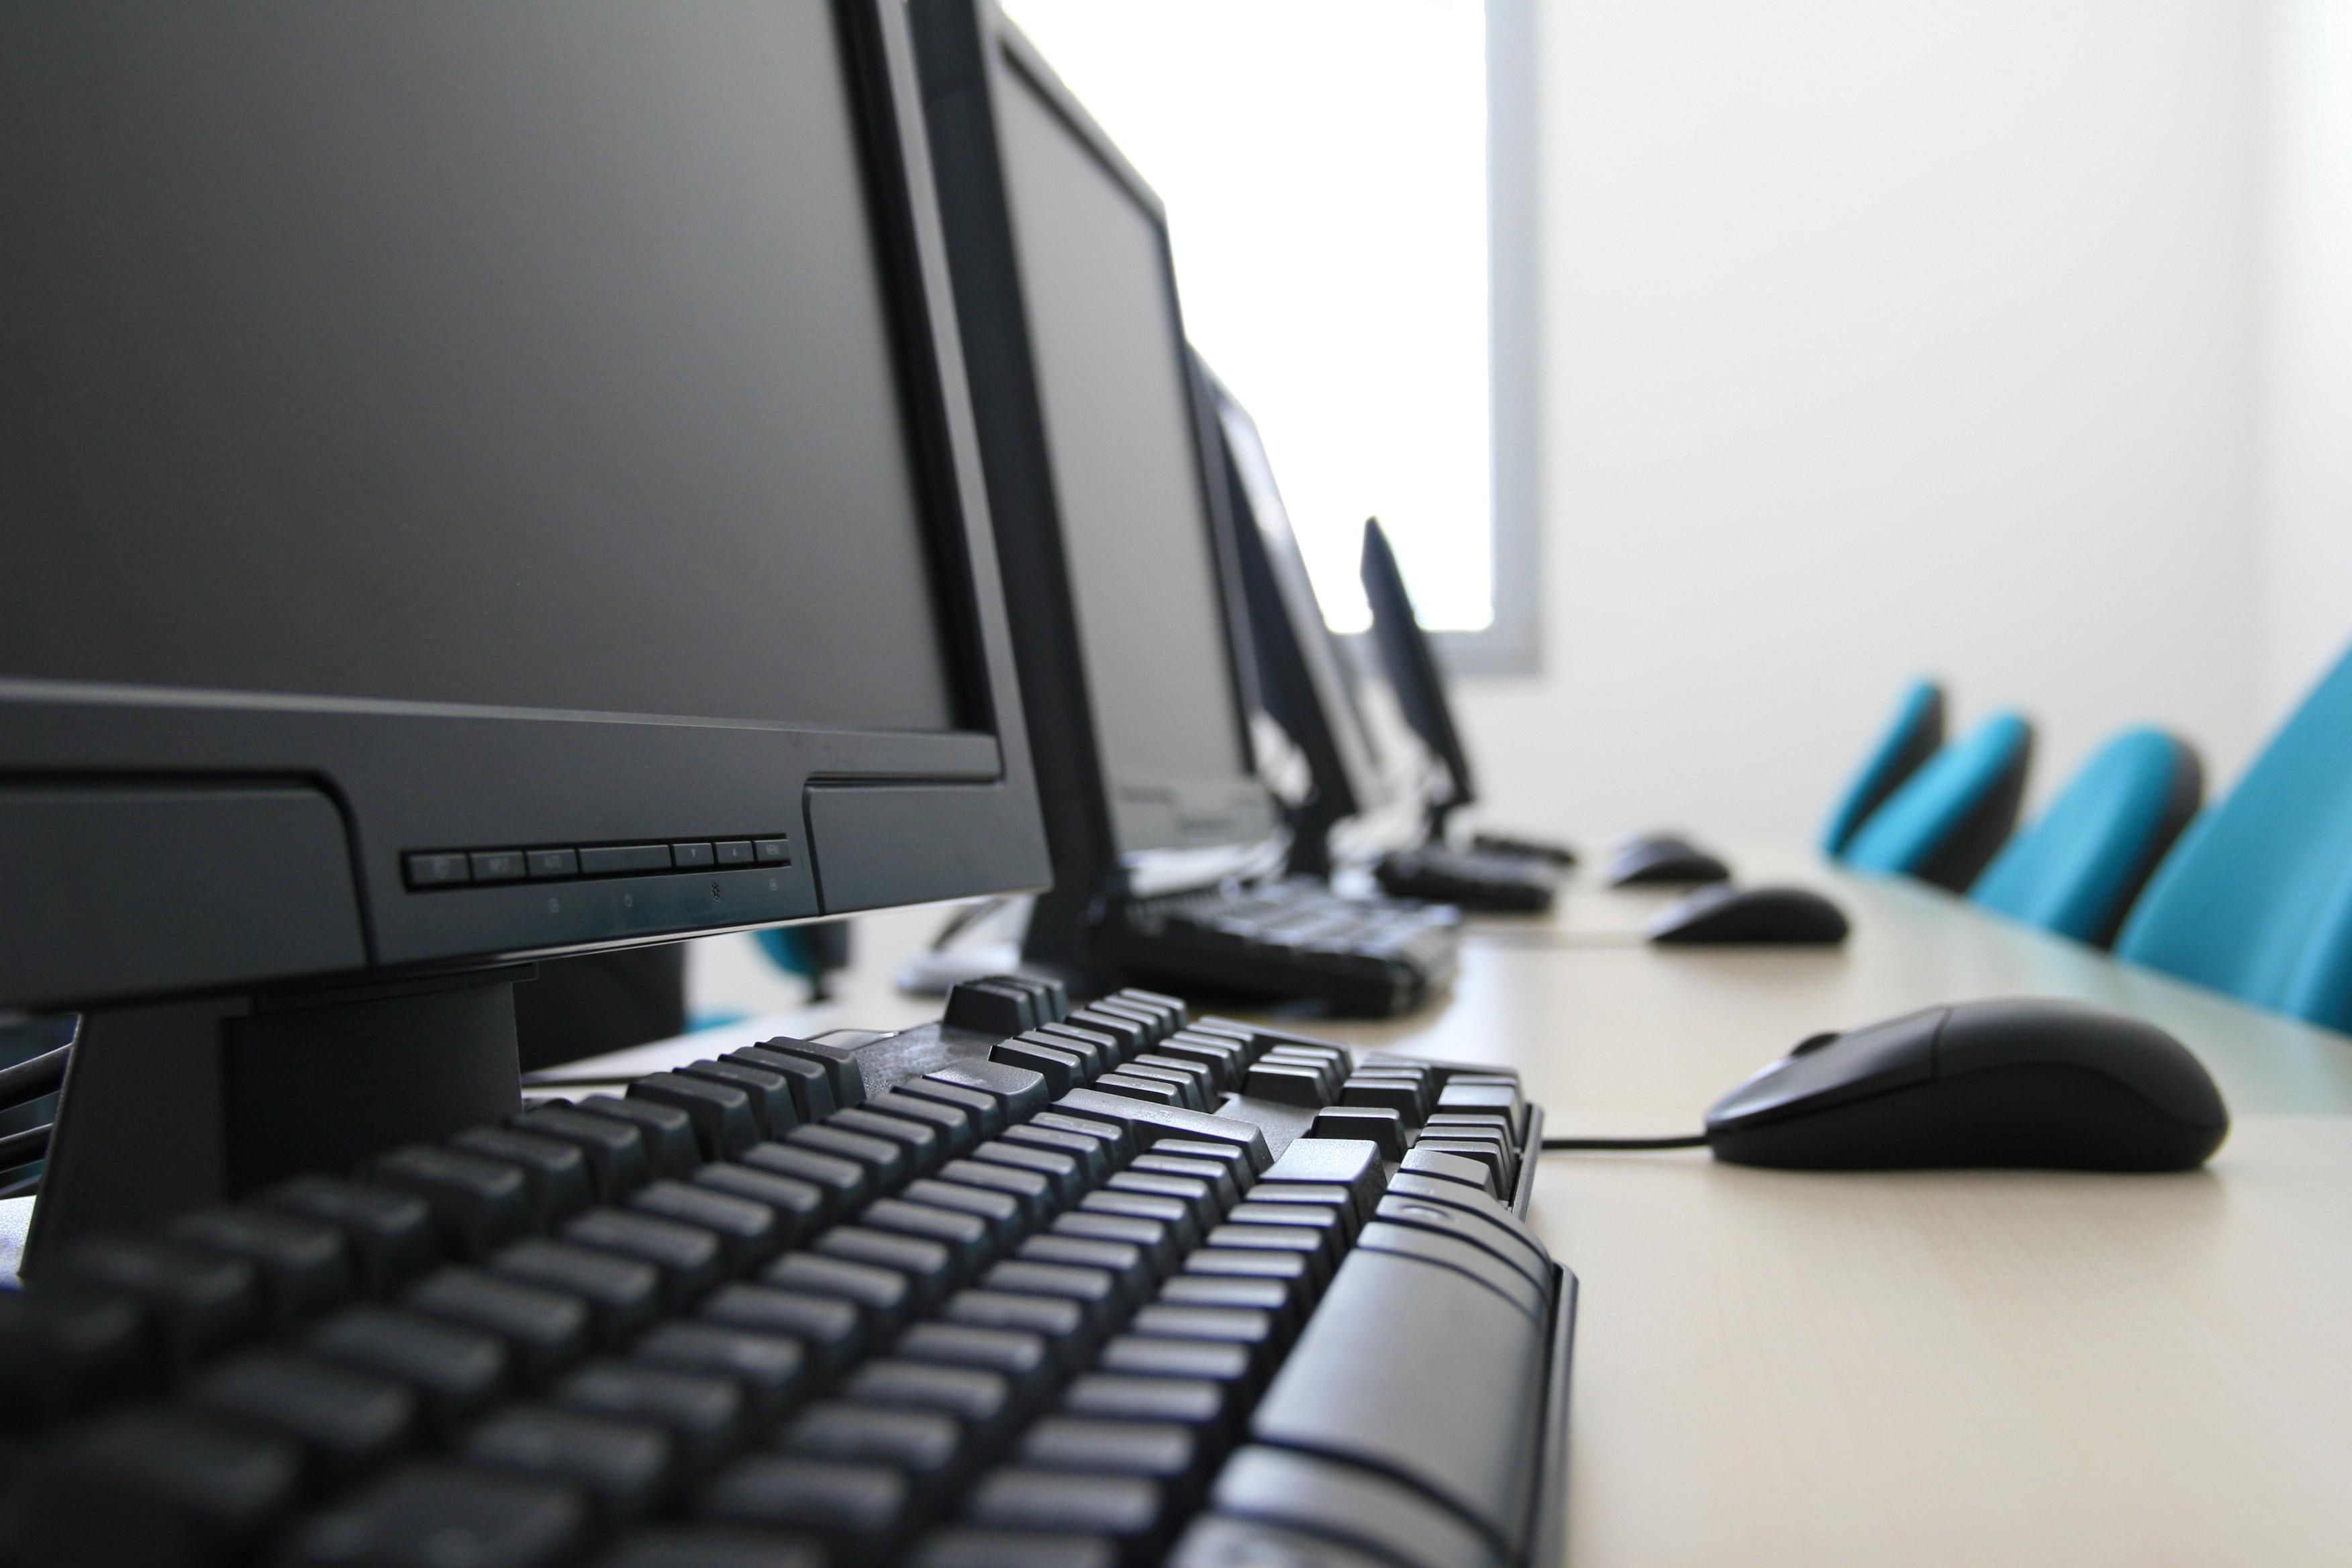 Equipos informáticos